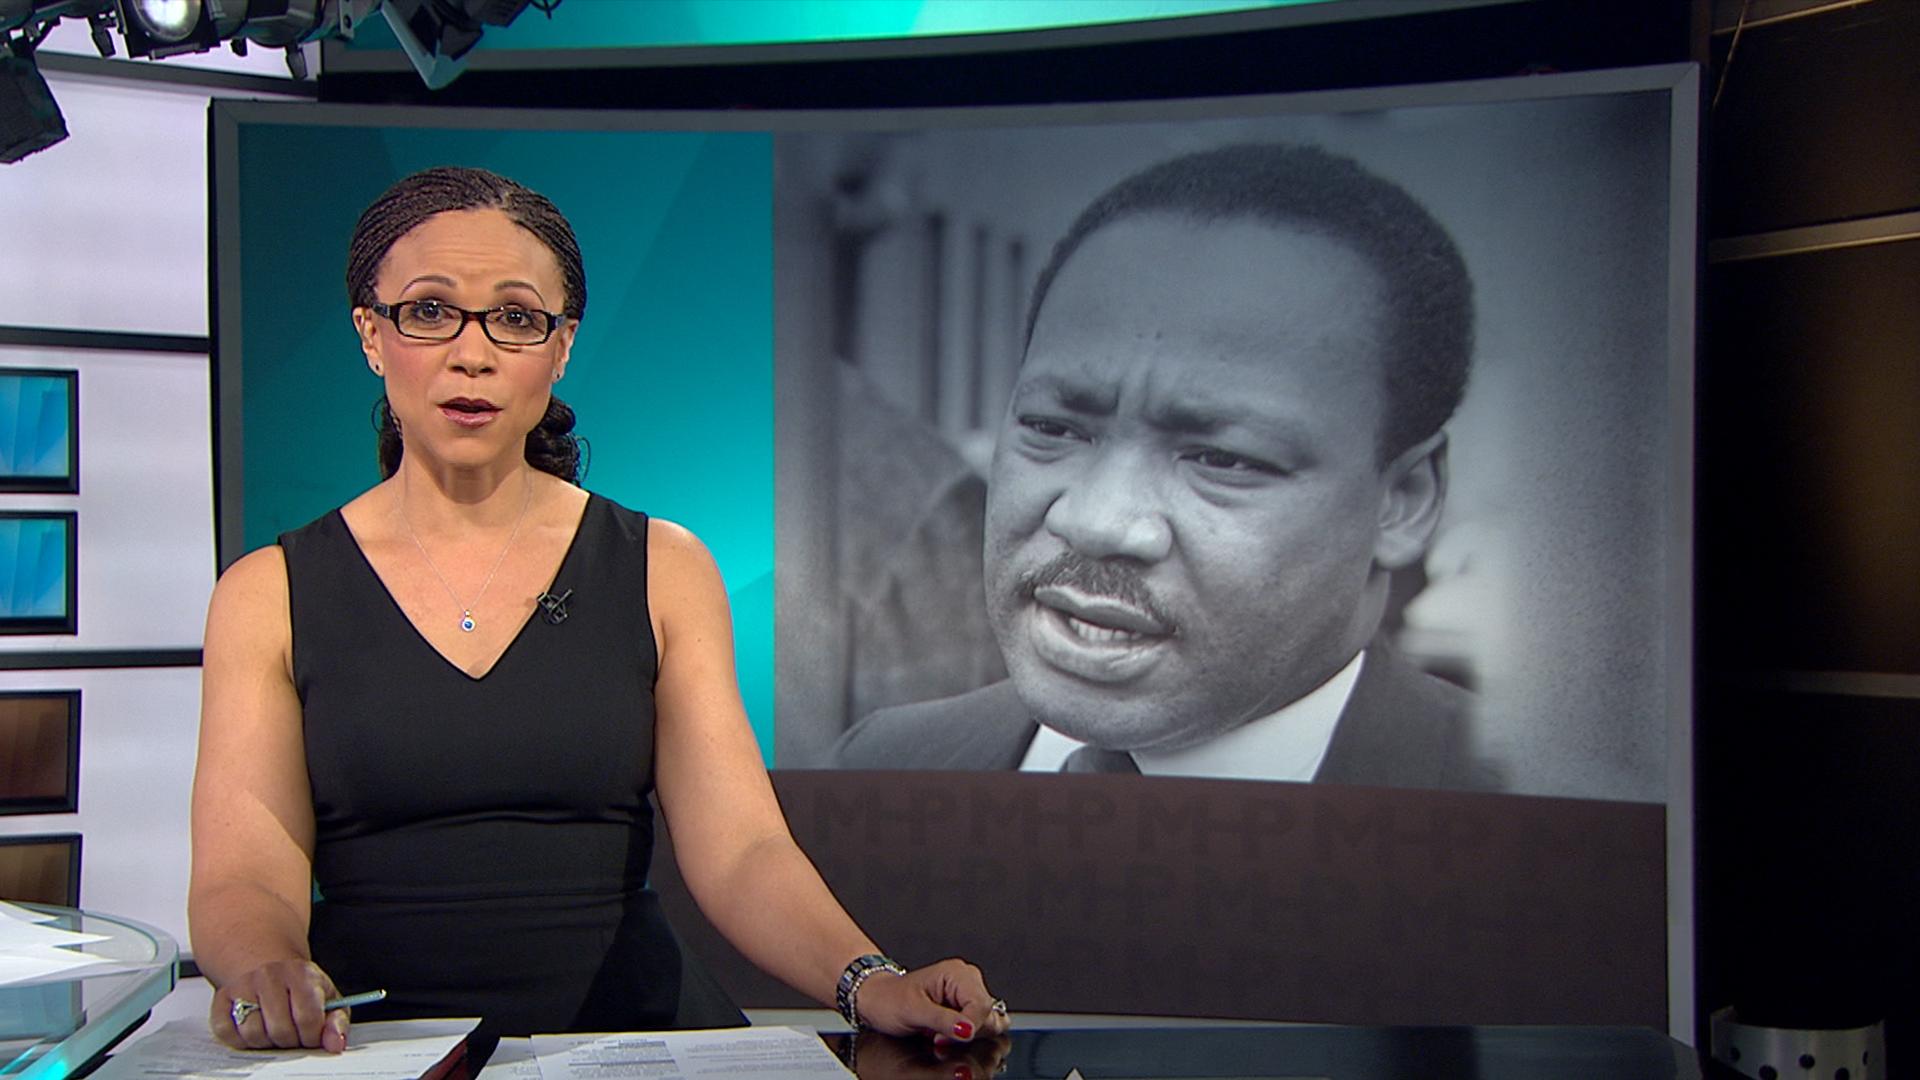 Recalling the history between MLK & the FBI